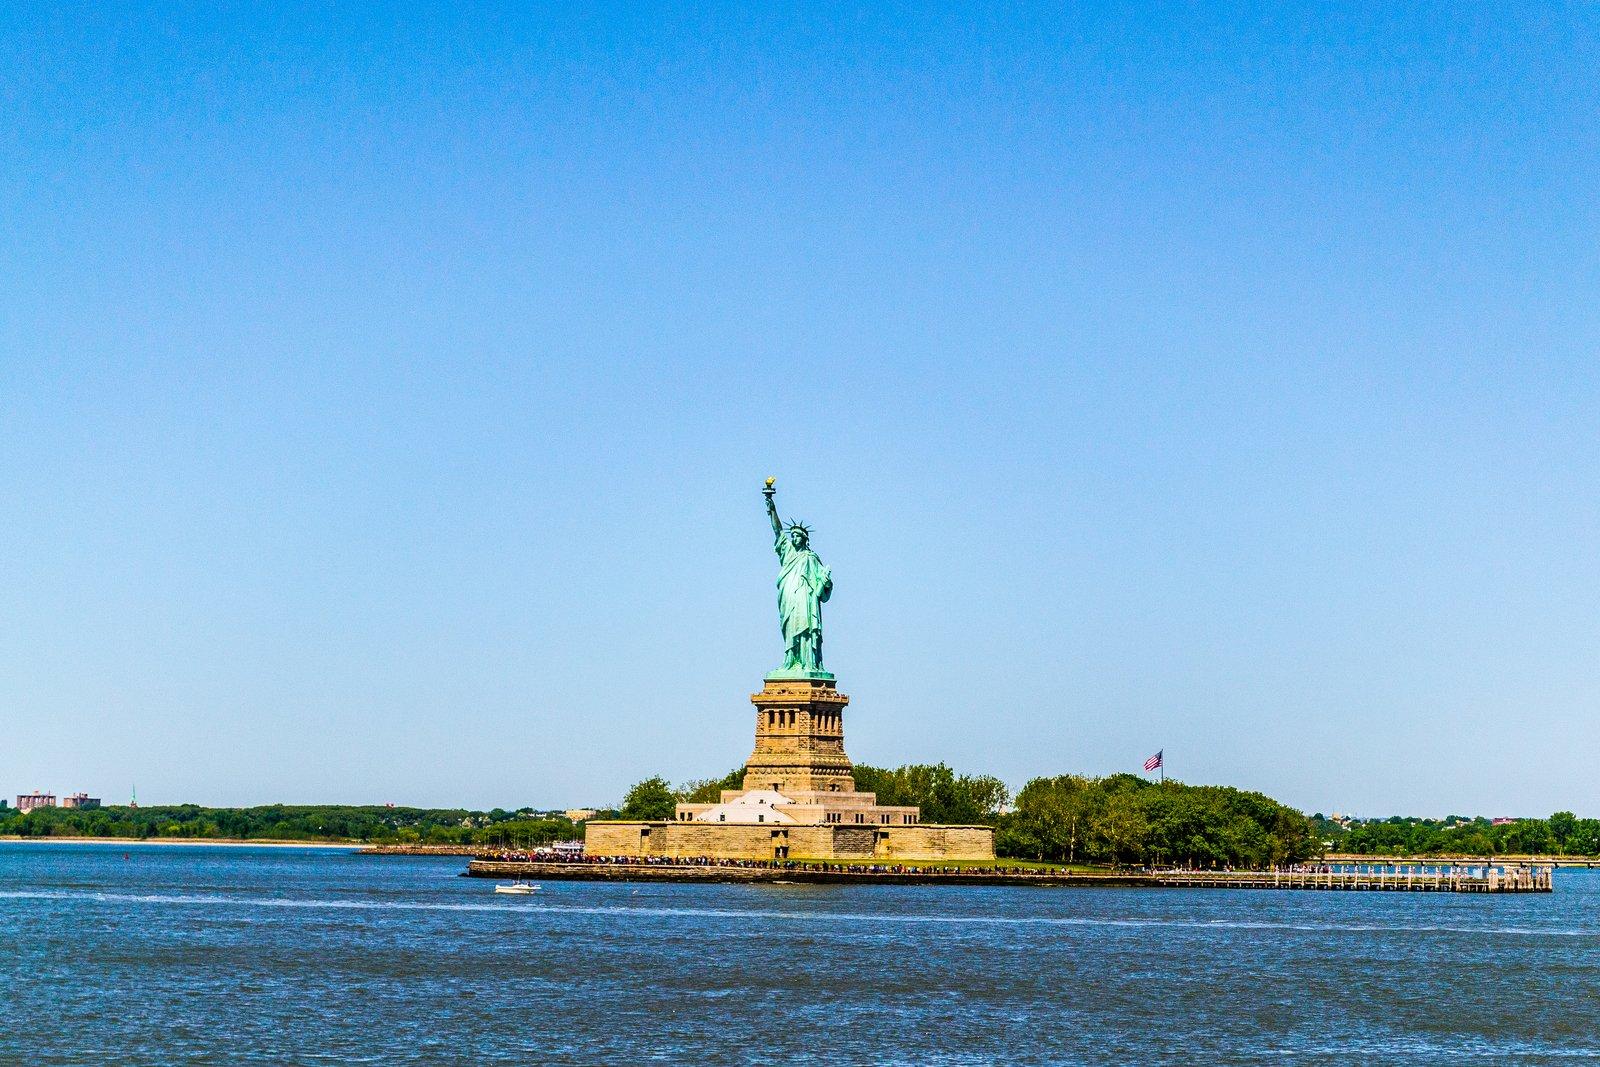 Port Ivory Staten Island, NY Private Investigator